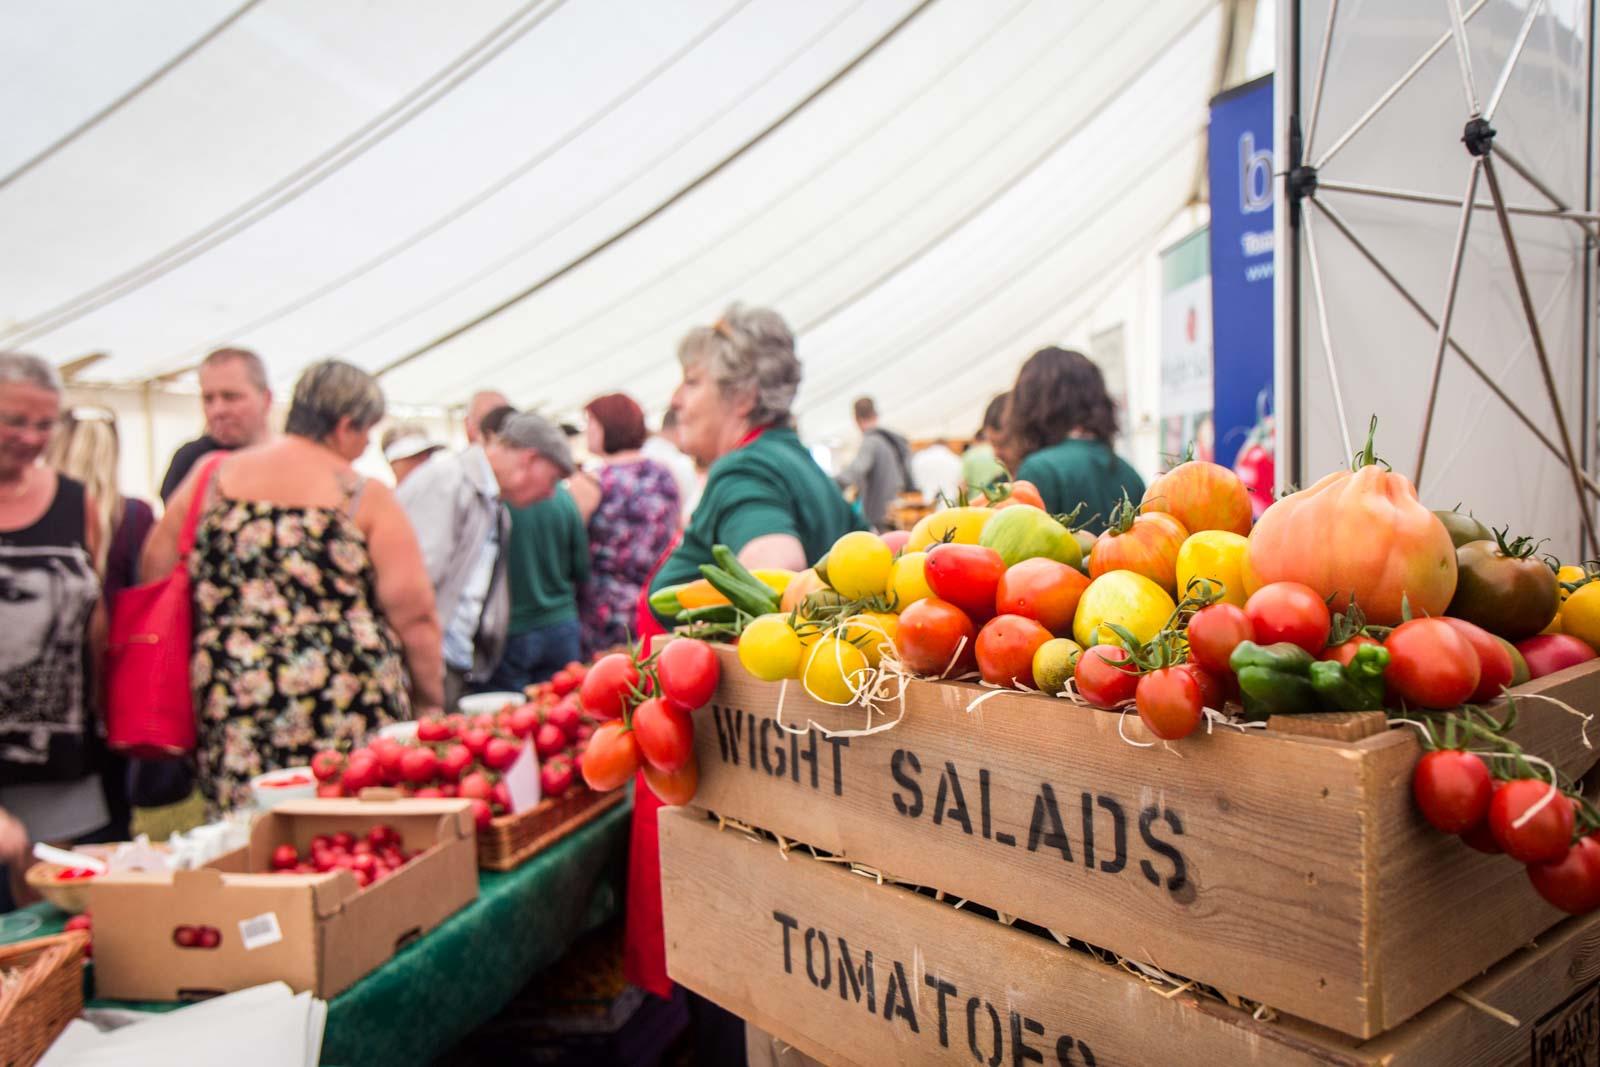 Garlic Festival, Isle of Wight, England